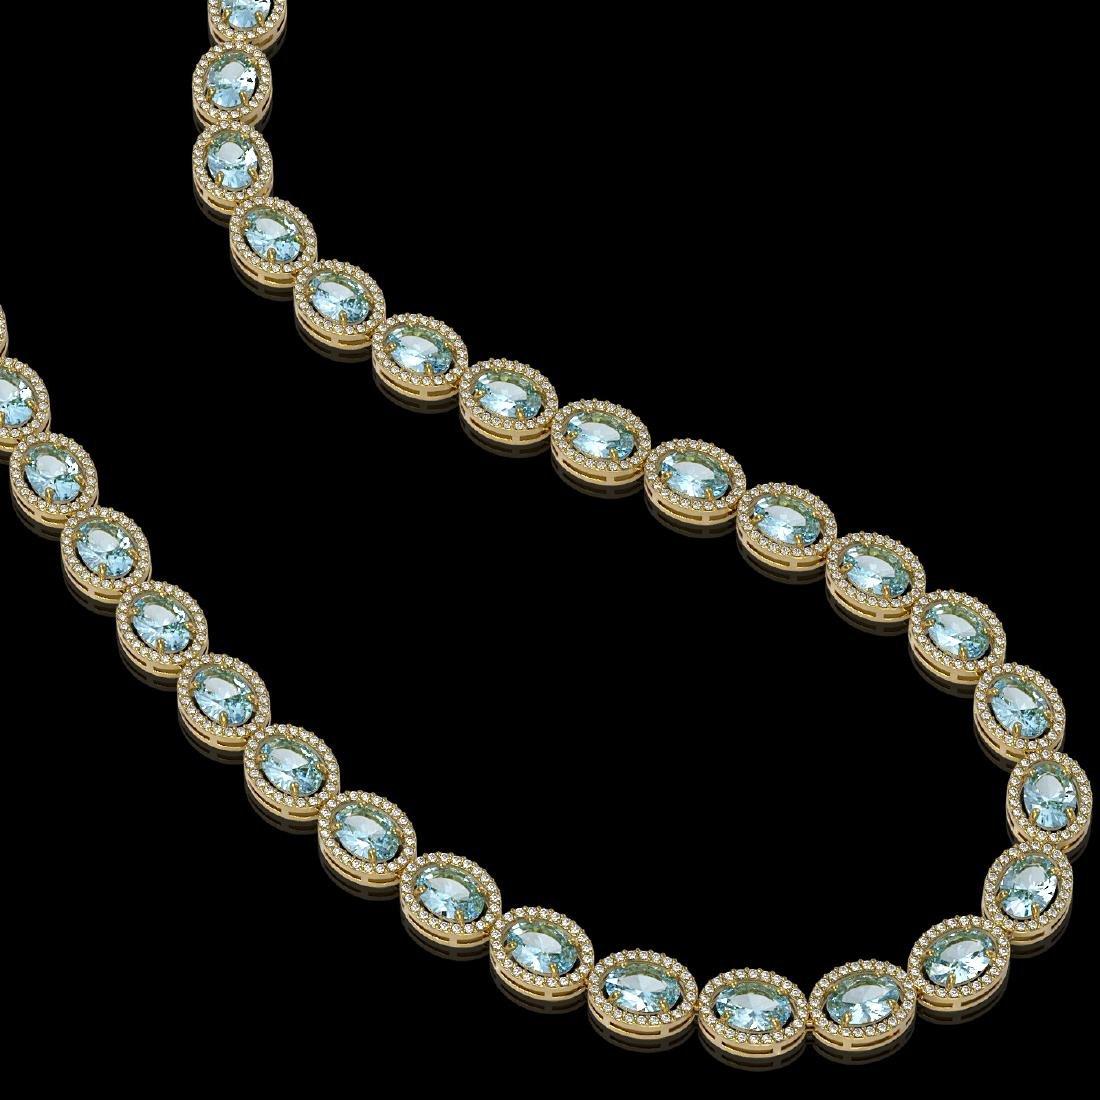 41.88 CTW Aquamarine & Diamond Halo Necklace 10K Yellow - 2